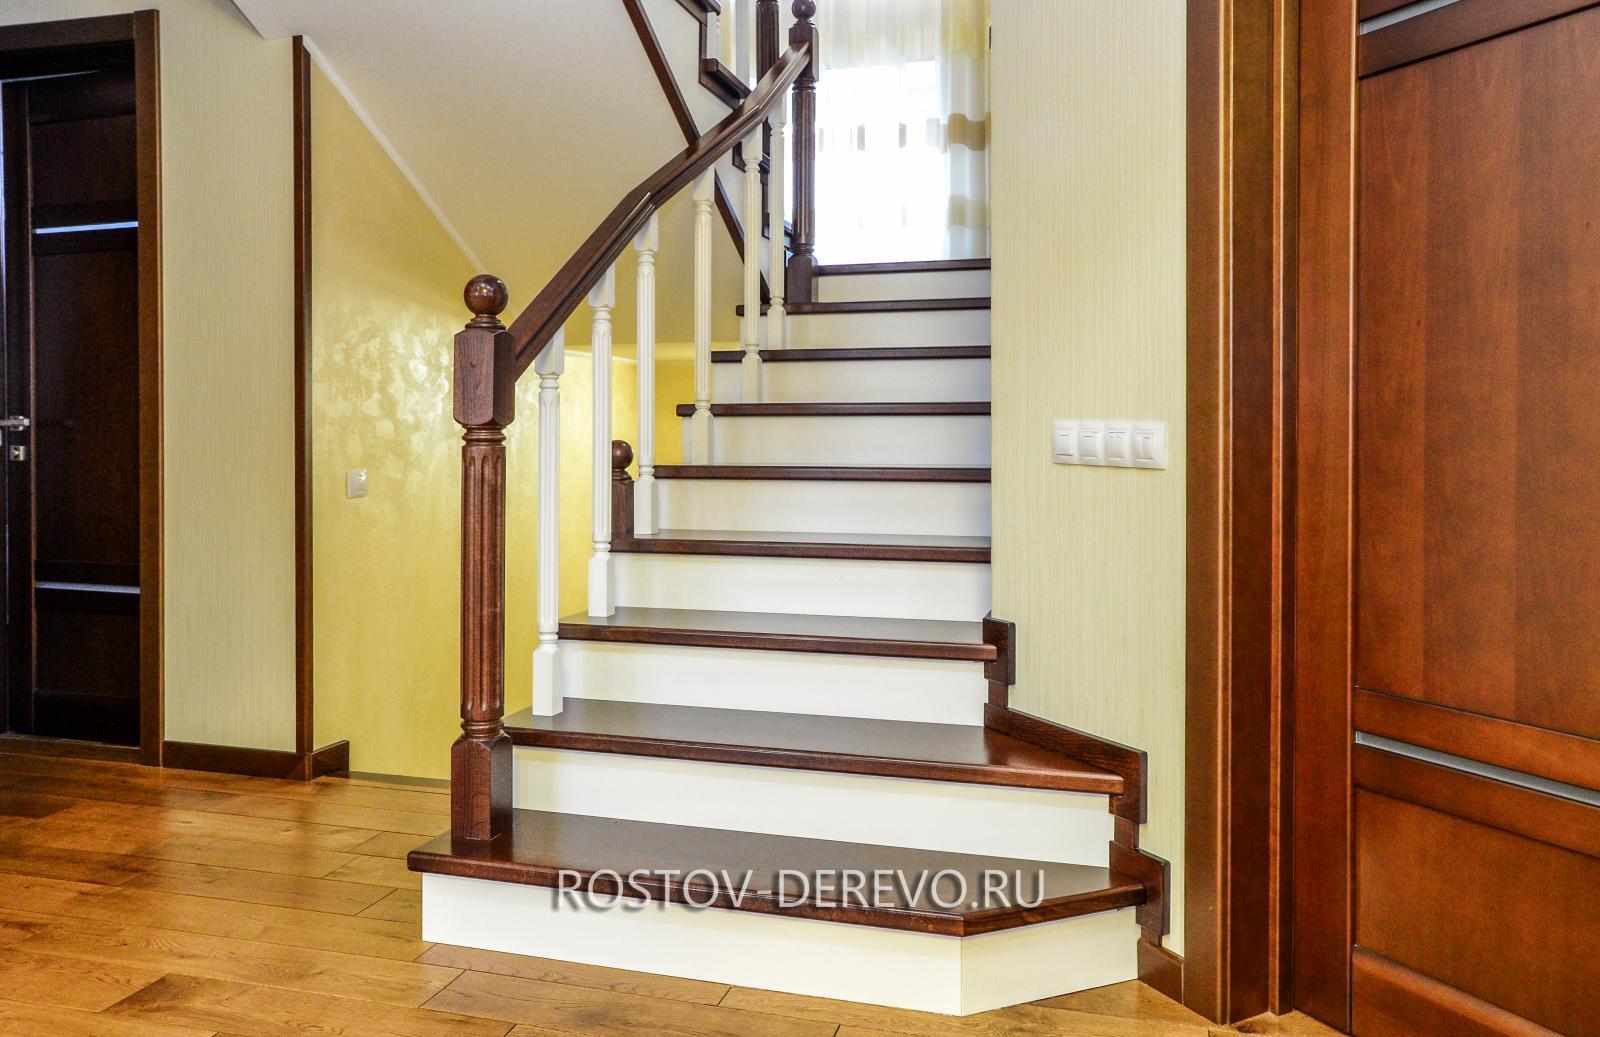 Балясины для лестниц, столбы для лестниц